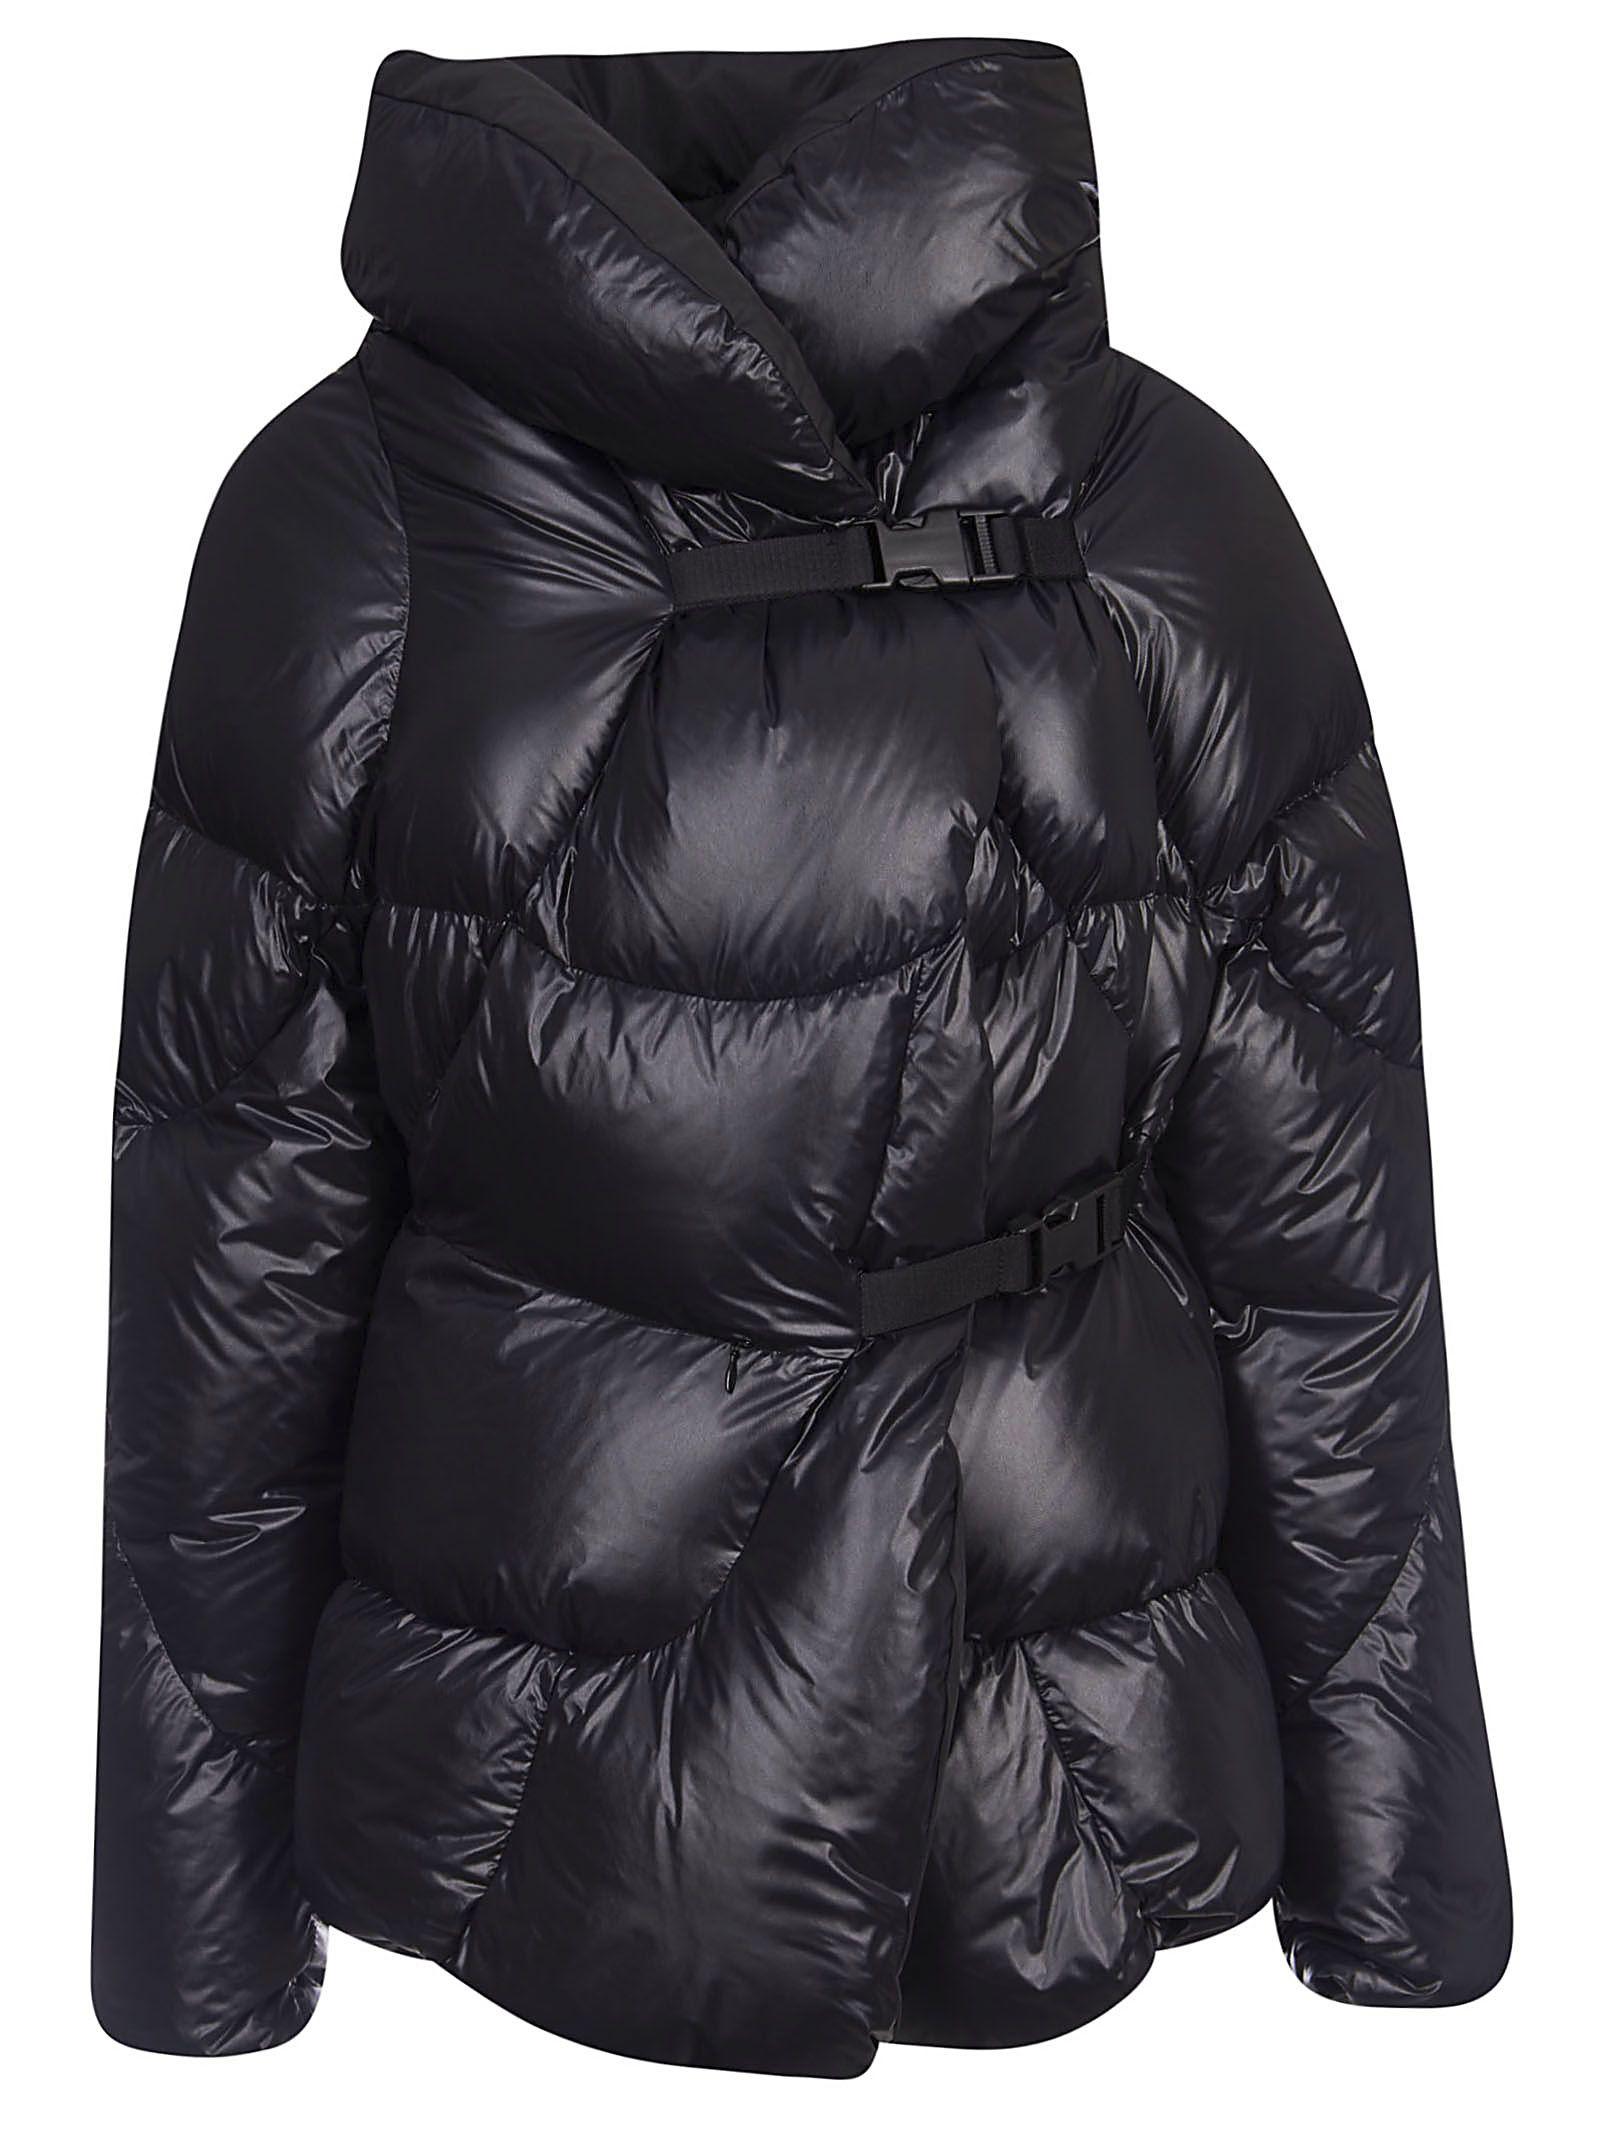 AHIRAIN Classic Padded Jacket in Black